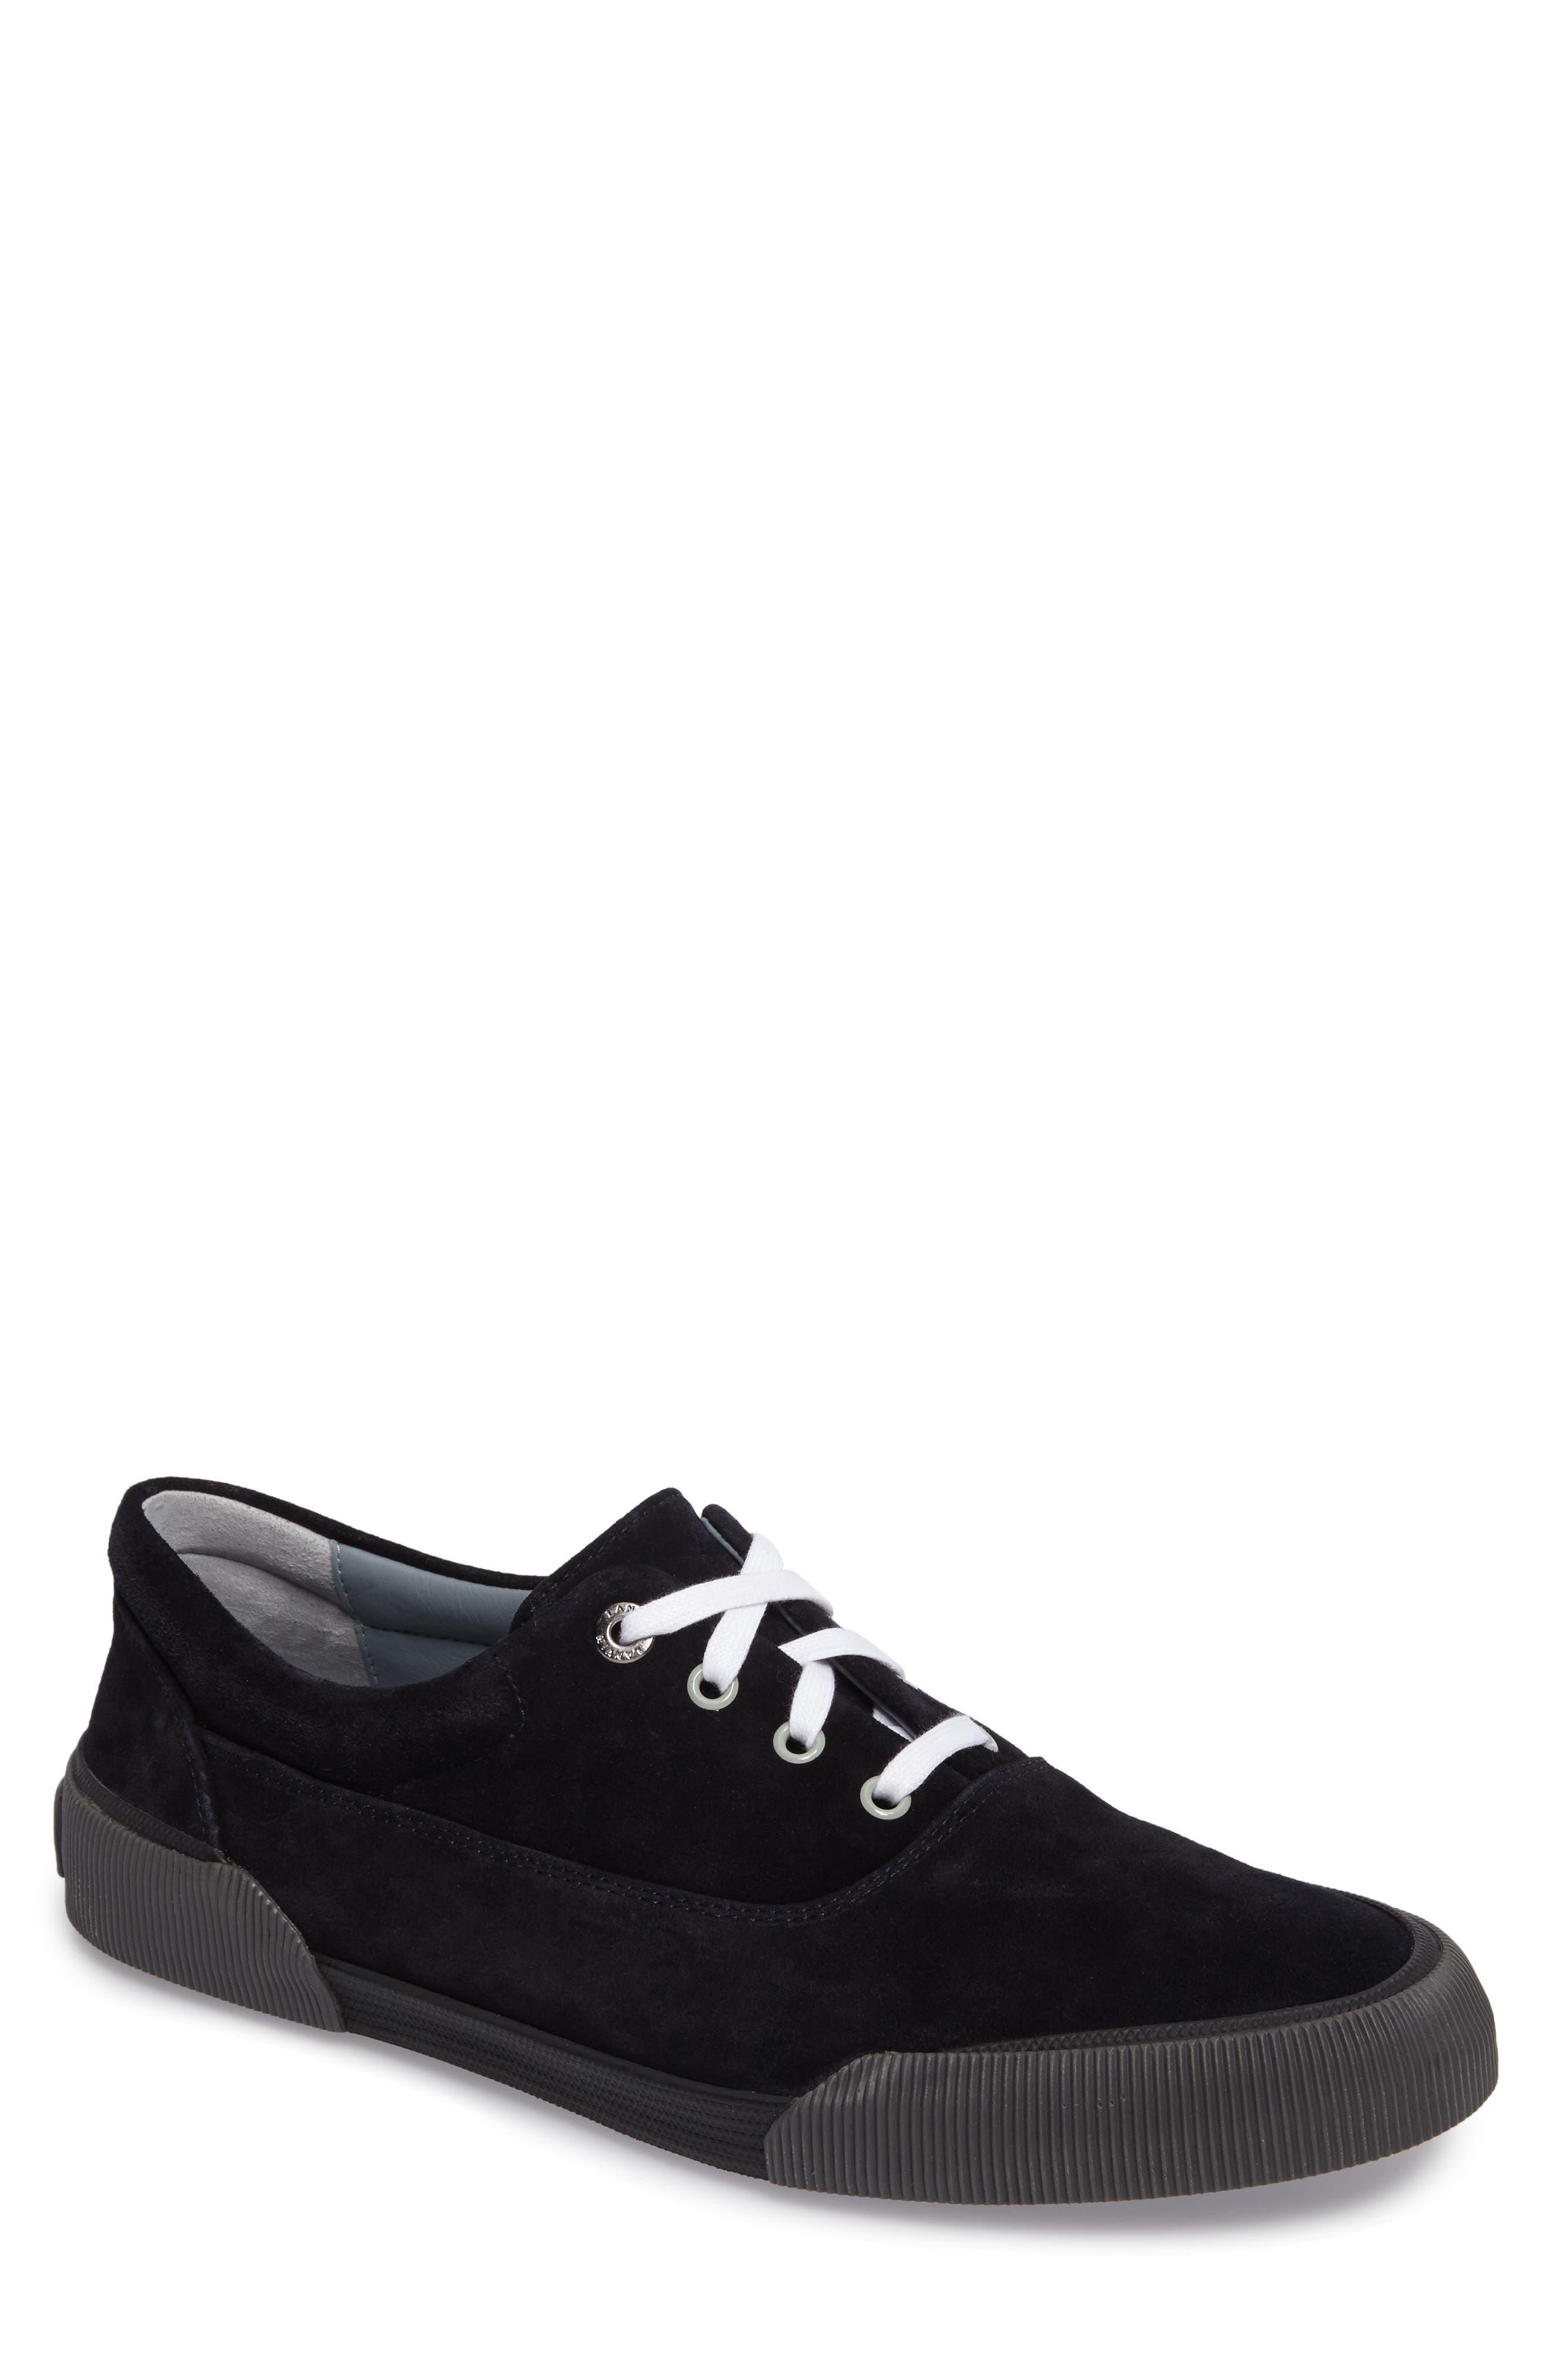 Main Image - Lanvin Suede Sneaker (Men)